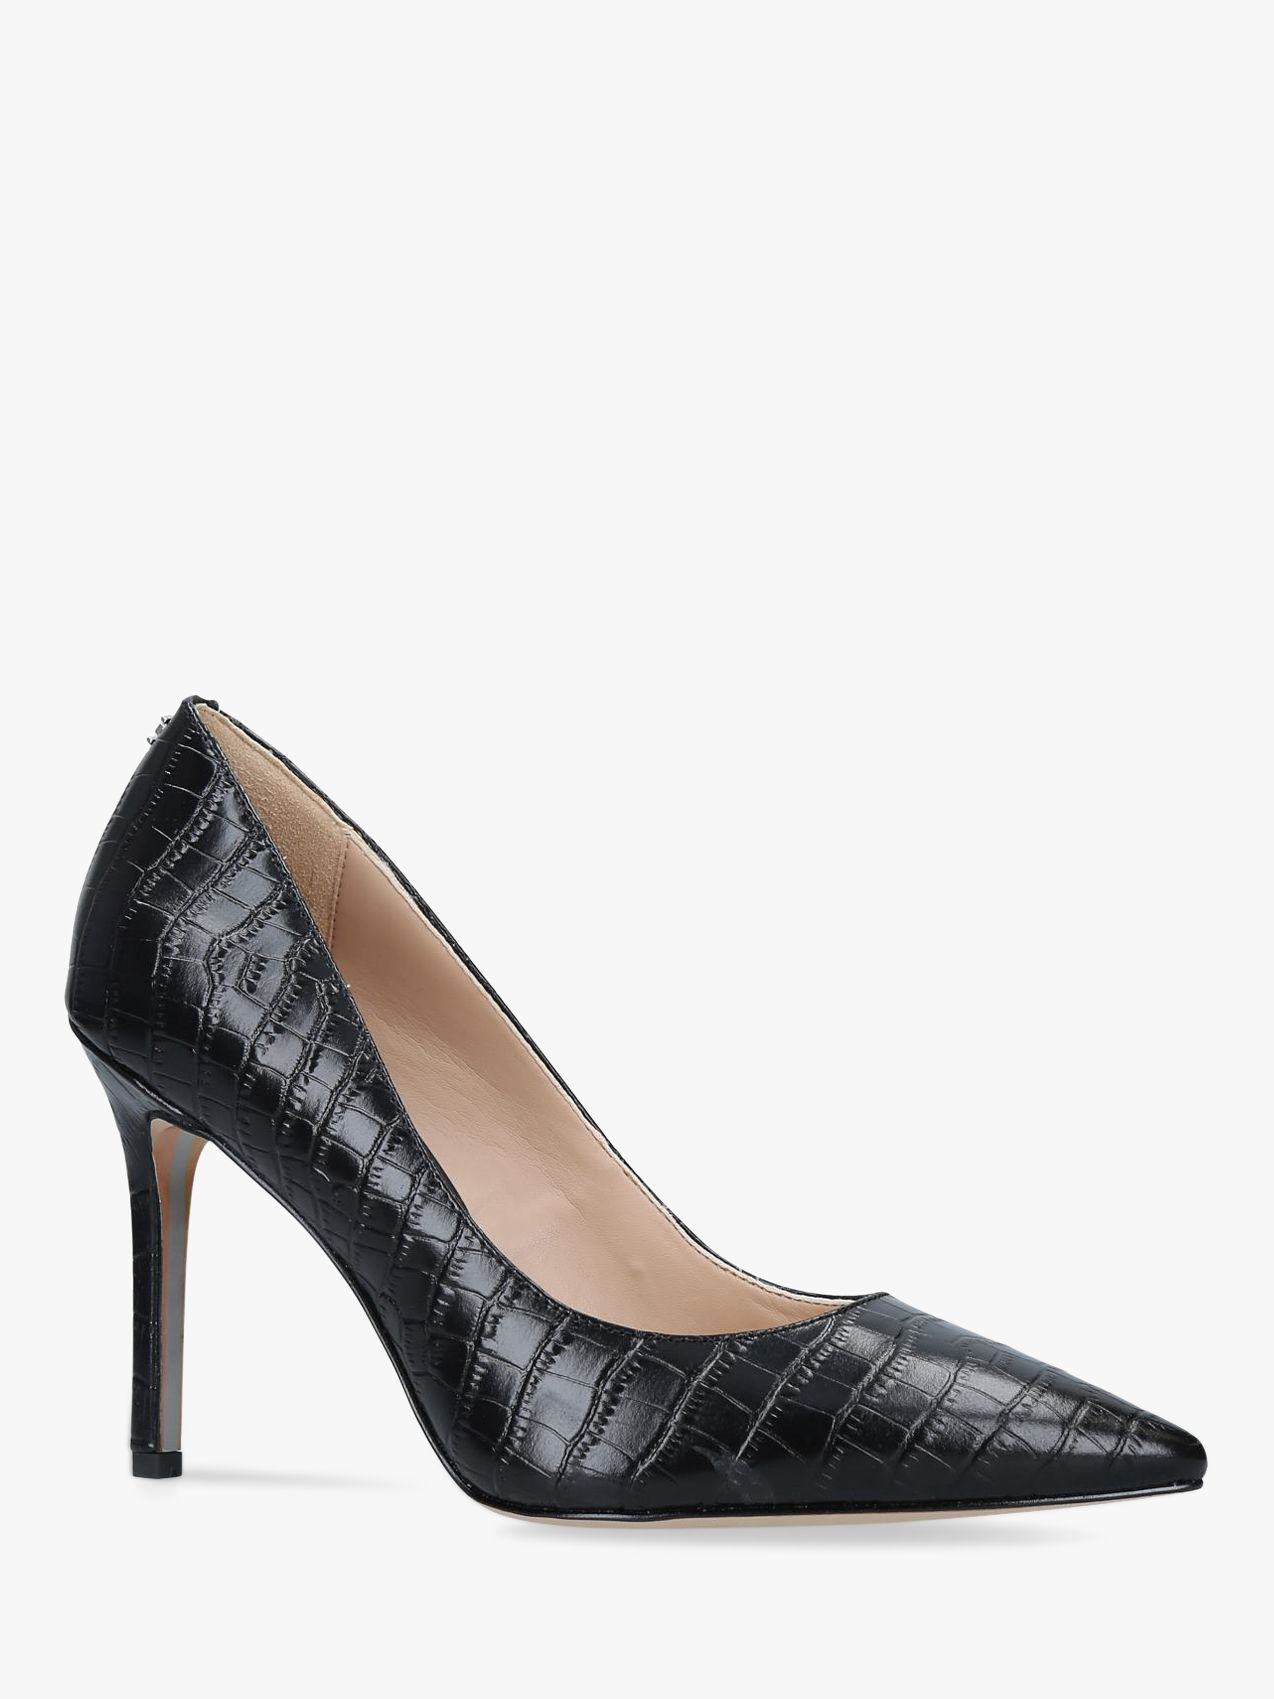 Sam Edelman Sam Edelman Hazel Leather Croc Stiletto Heel Court Shoes, Black